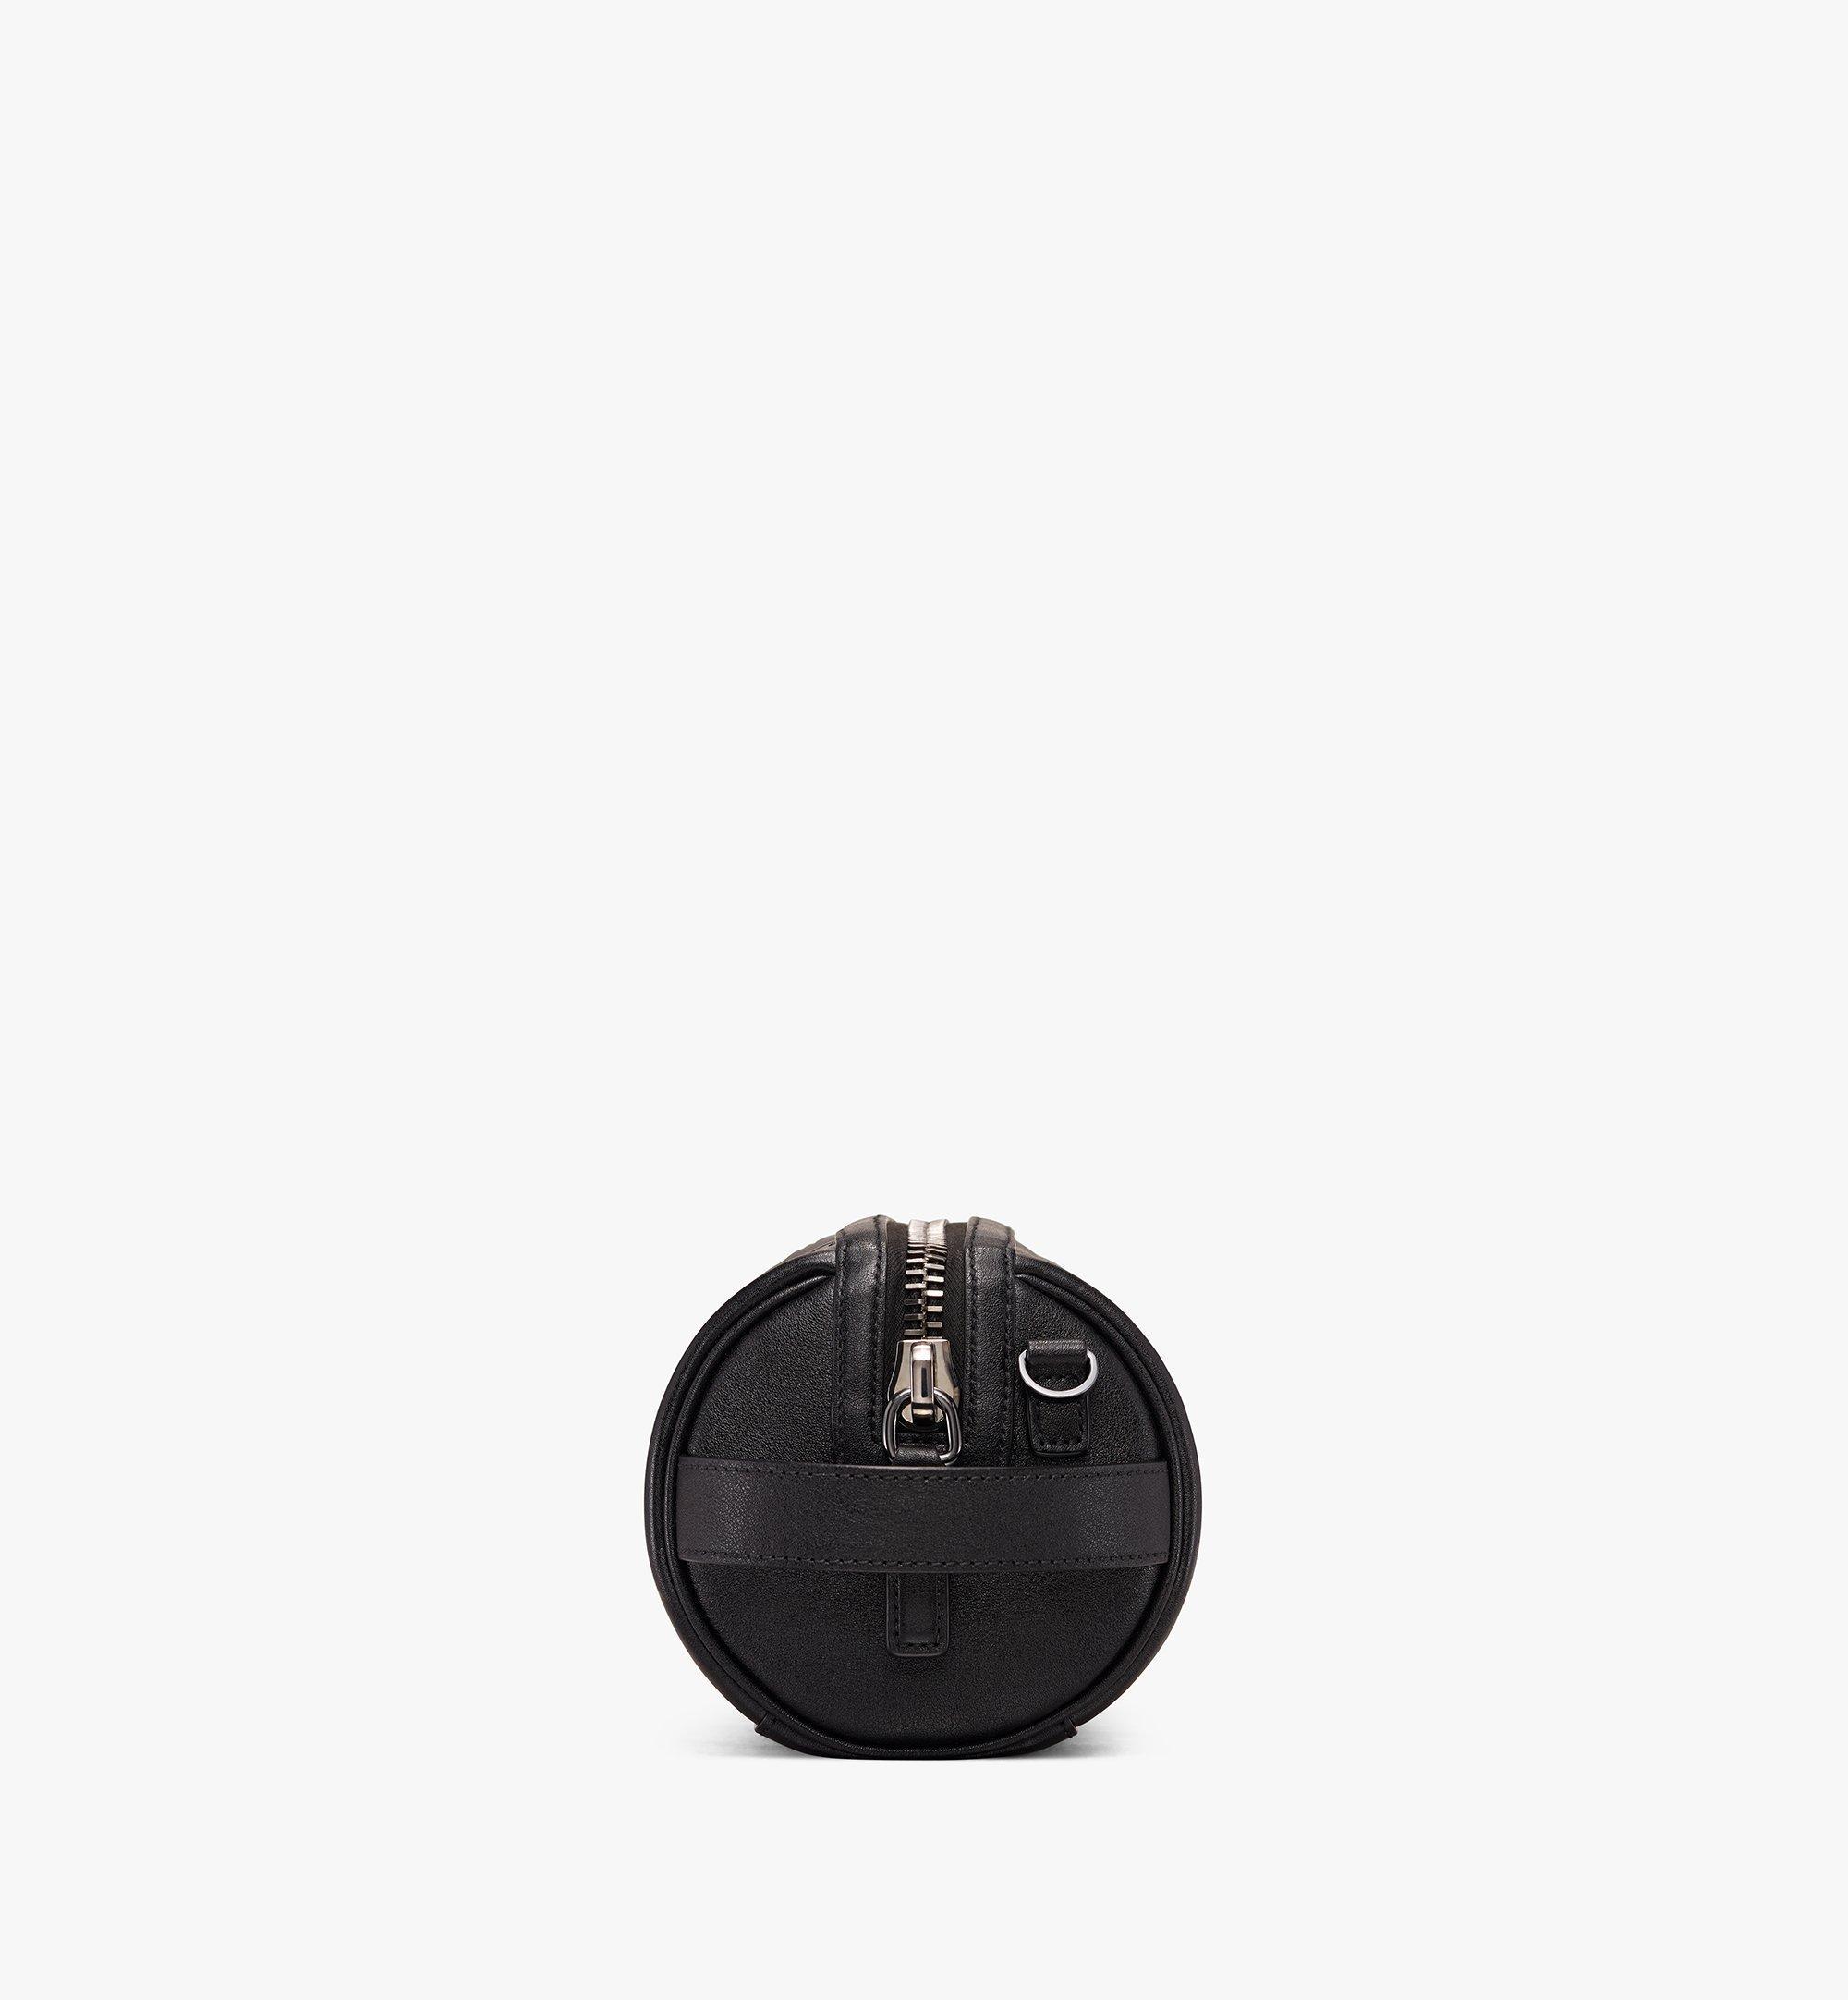 MCM Crossbody Bag in Embossed Lion Camo Black MUR9AES02BK001 Alternate View 2